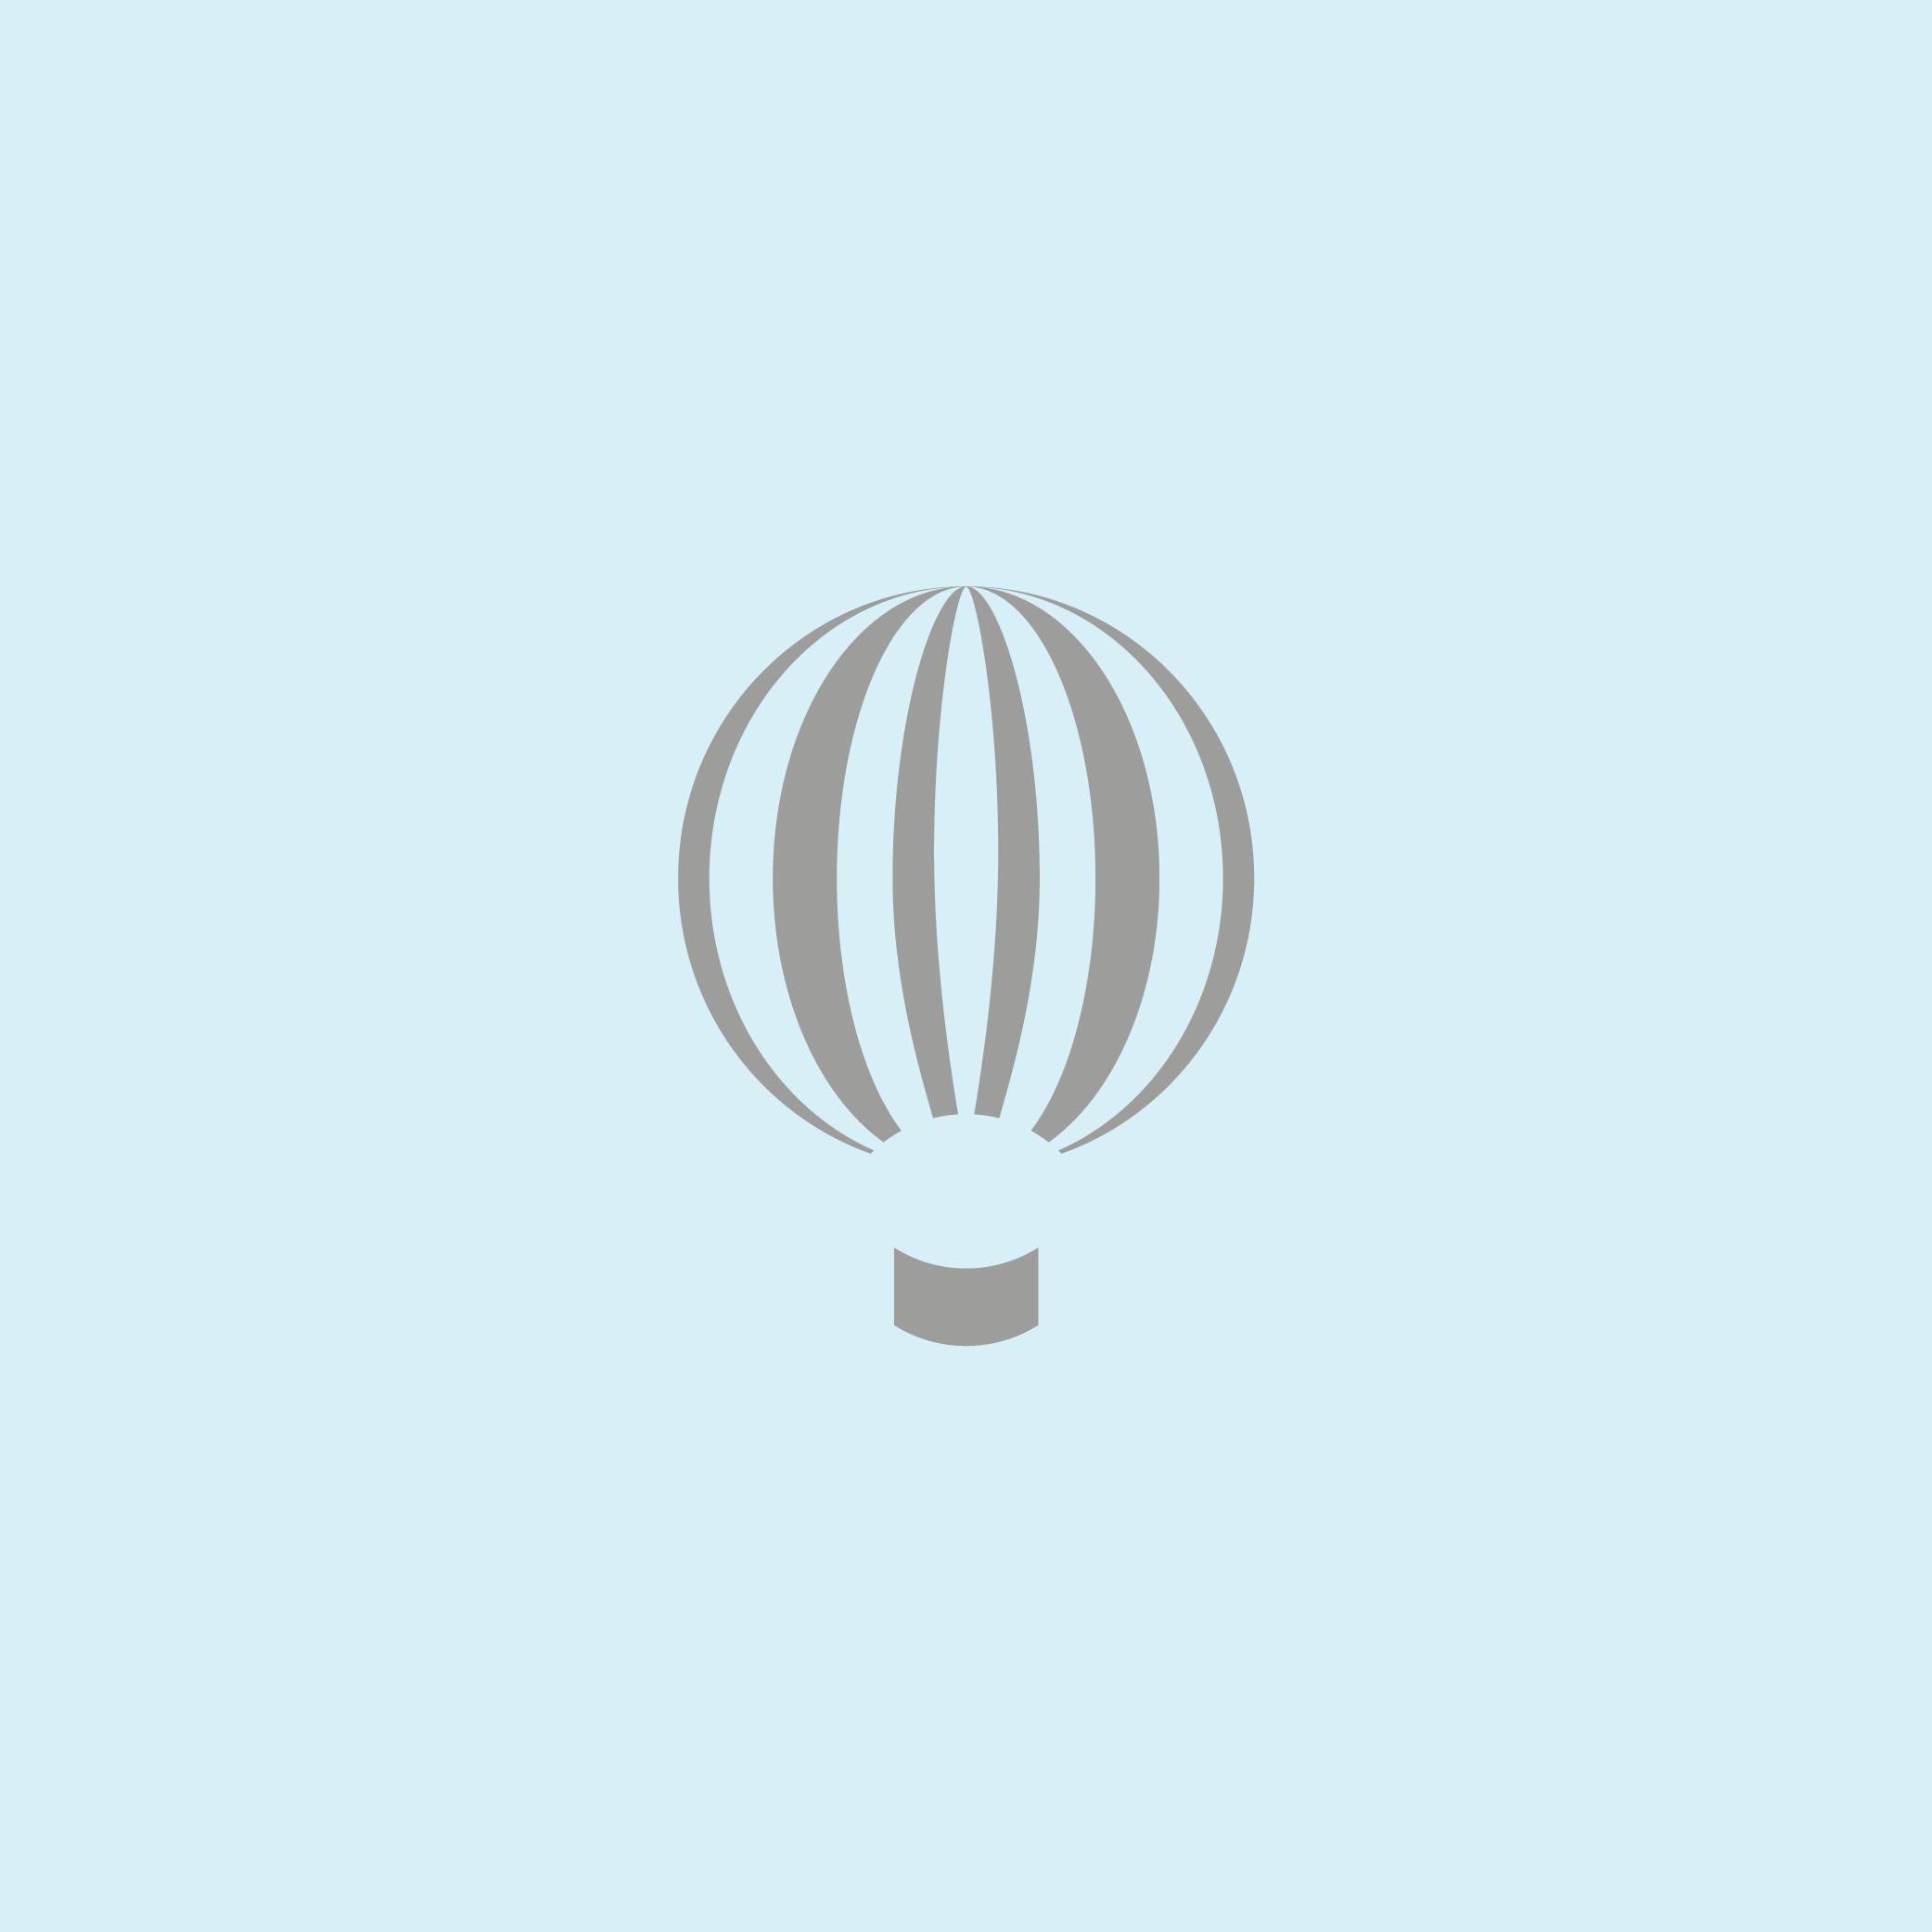 Hot Air Logo - Apollo Creative Co - Hampshire Graphic Design